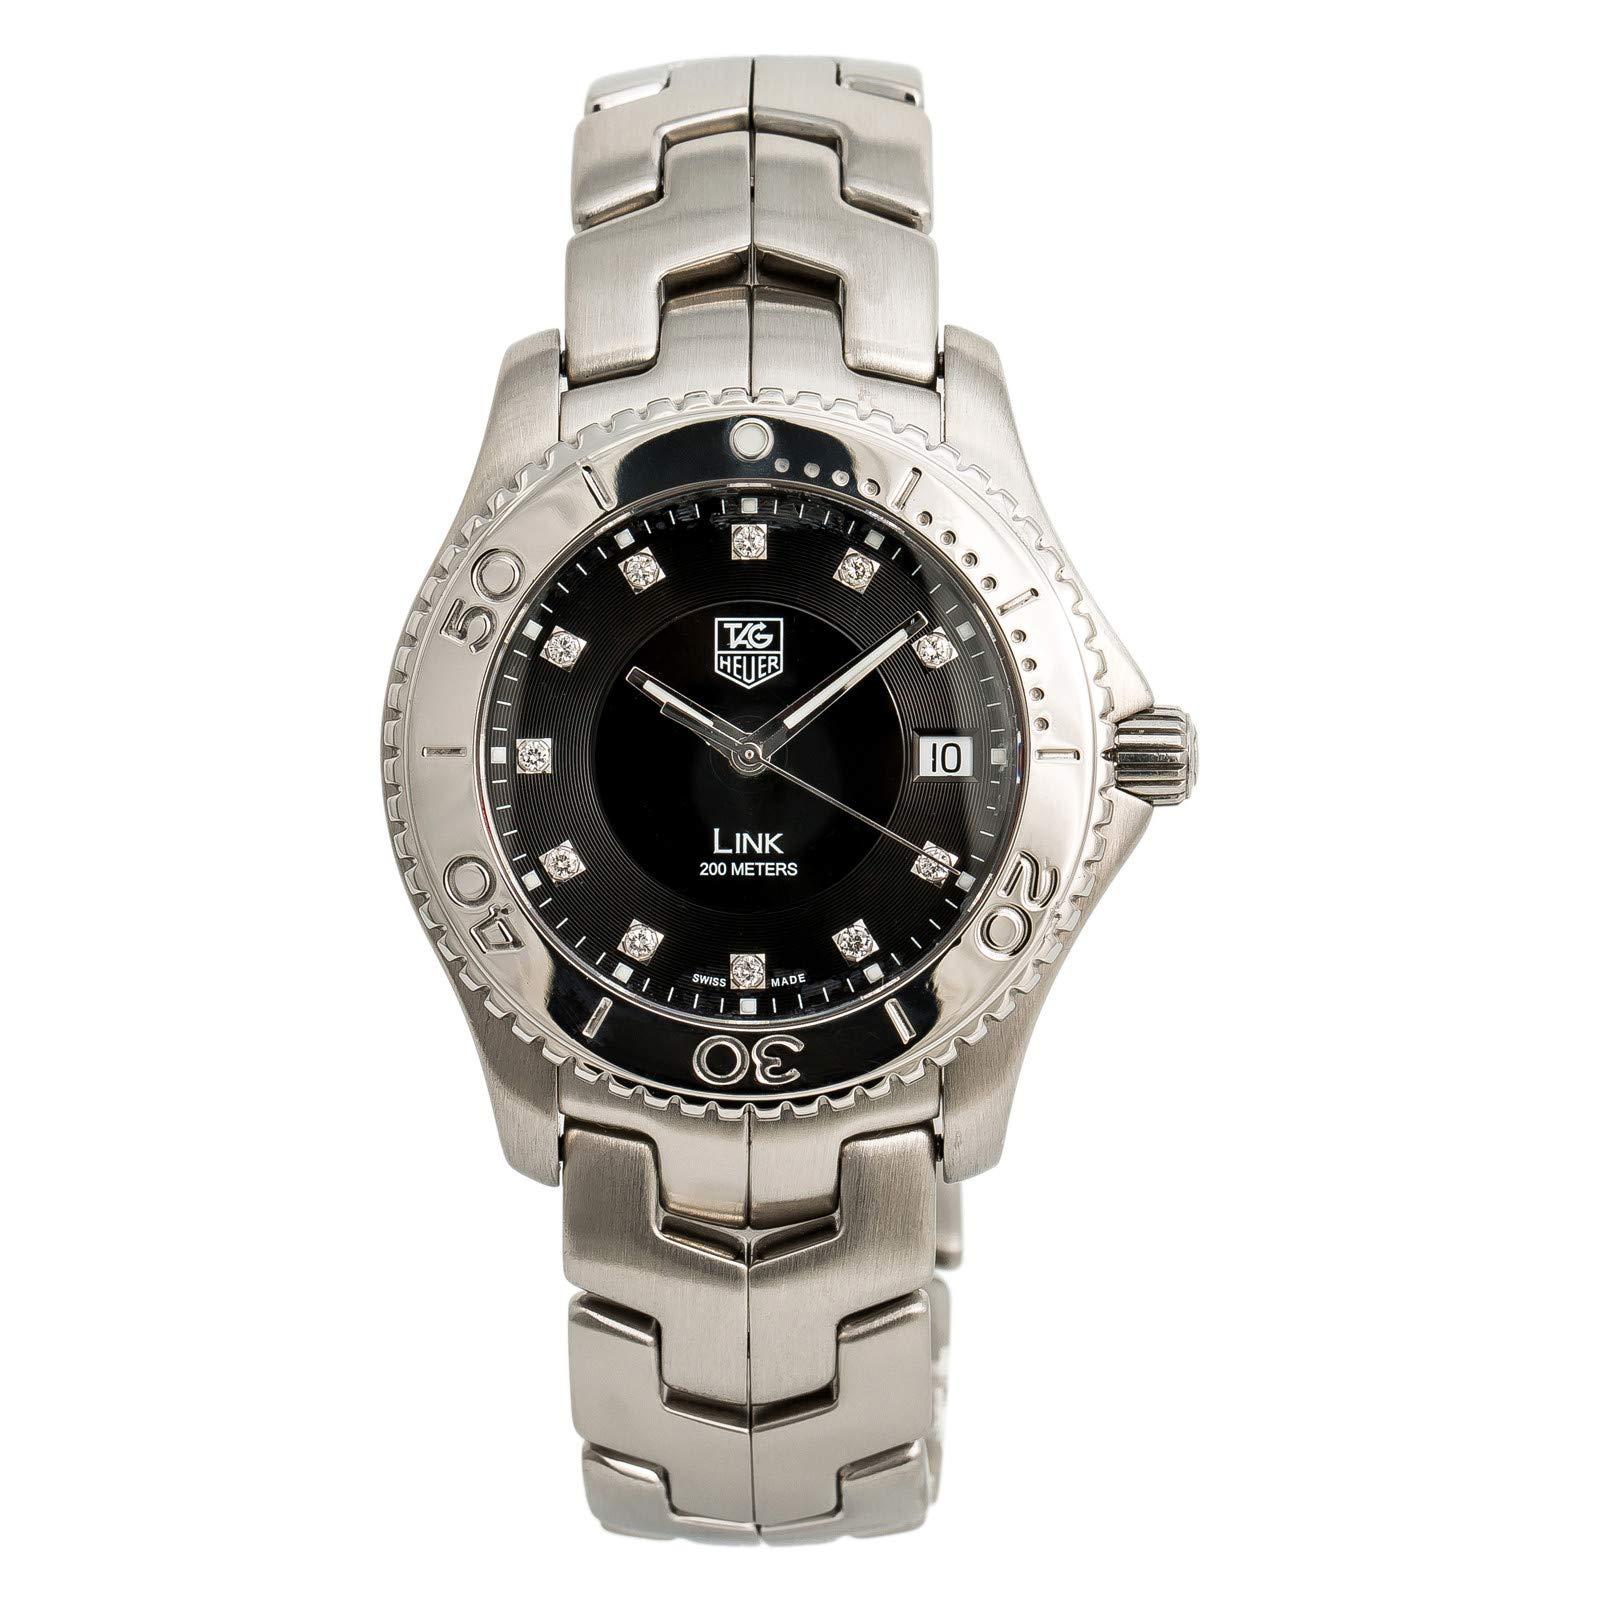 Tag Heuer Link Quartz Male Watch WJ1113.BA0575 (Certified Pre-Owned)